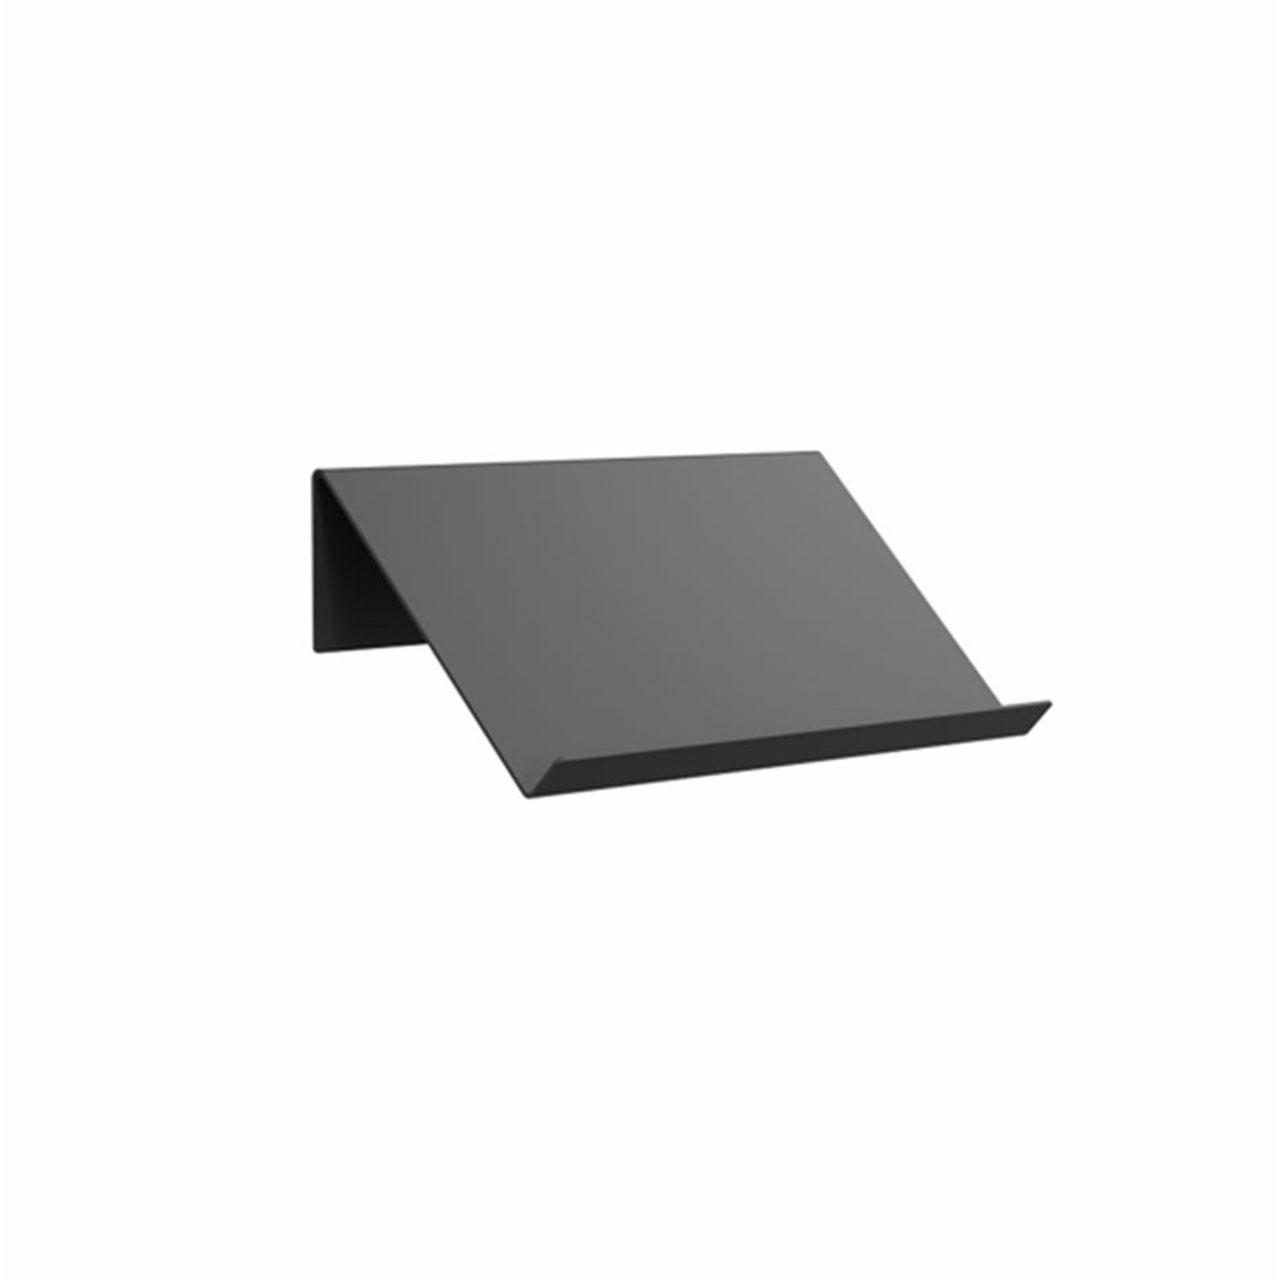 Frost Schuh-/Magazinregal   Matt schwarz,  60 cm